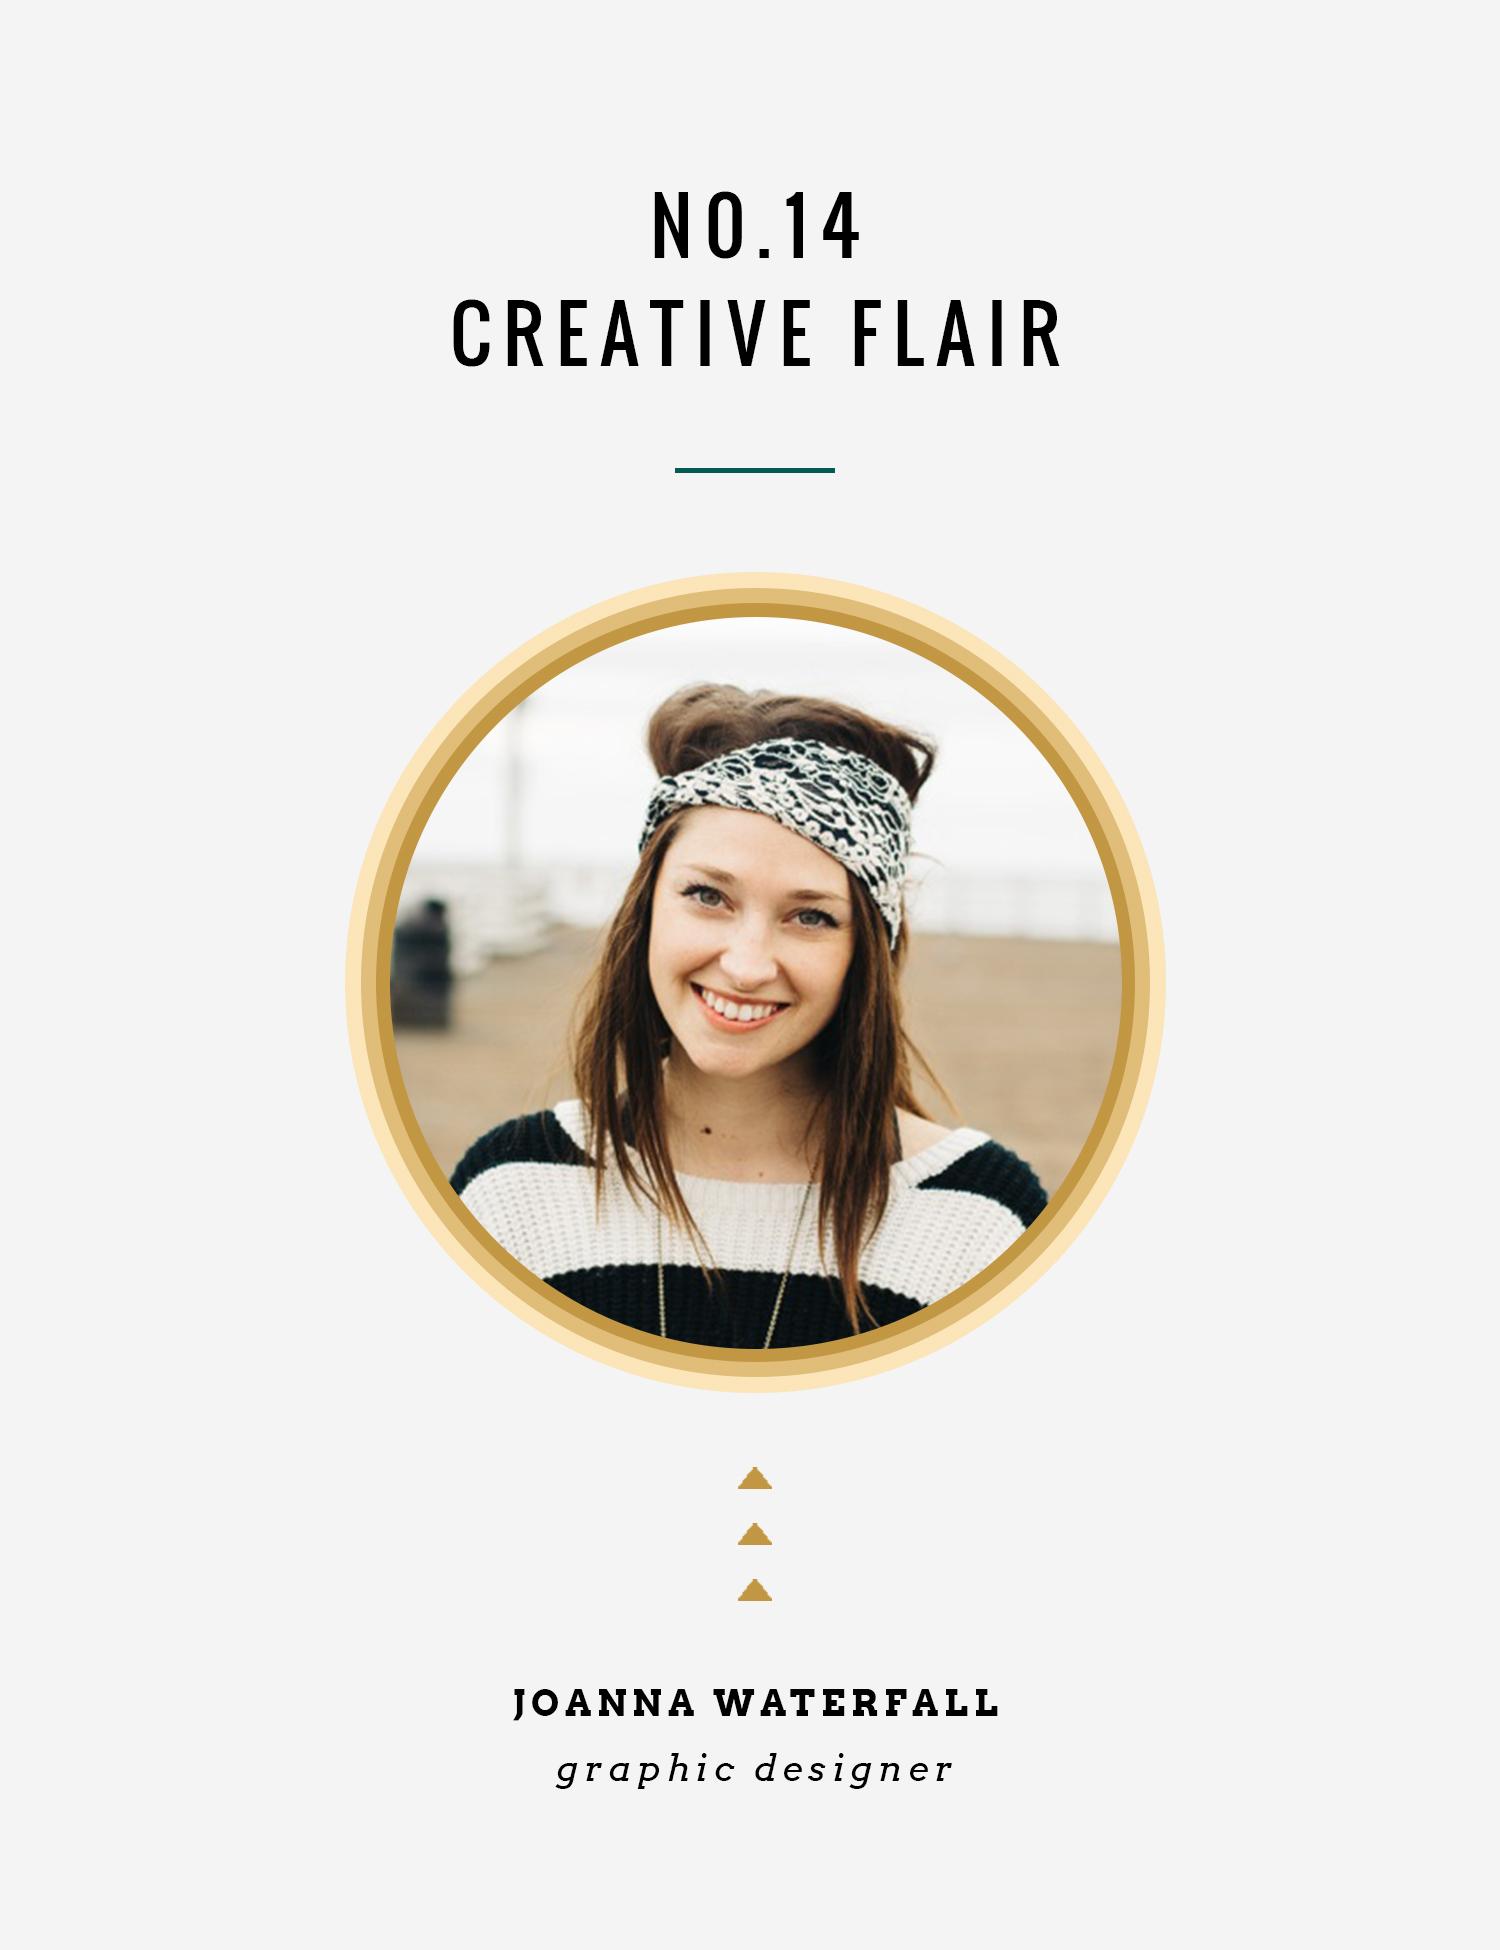 creativeflair_joannawaterfall_inbetween